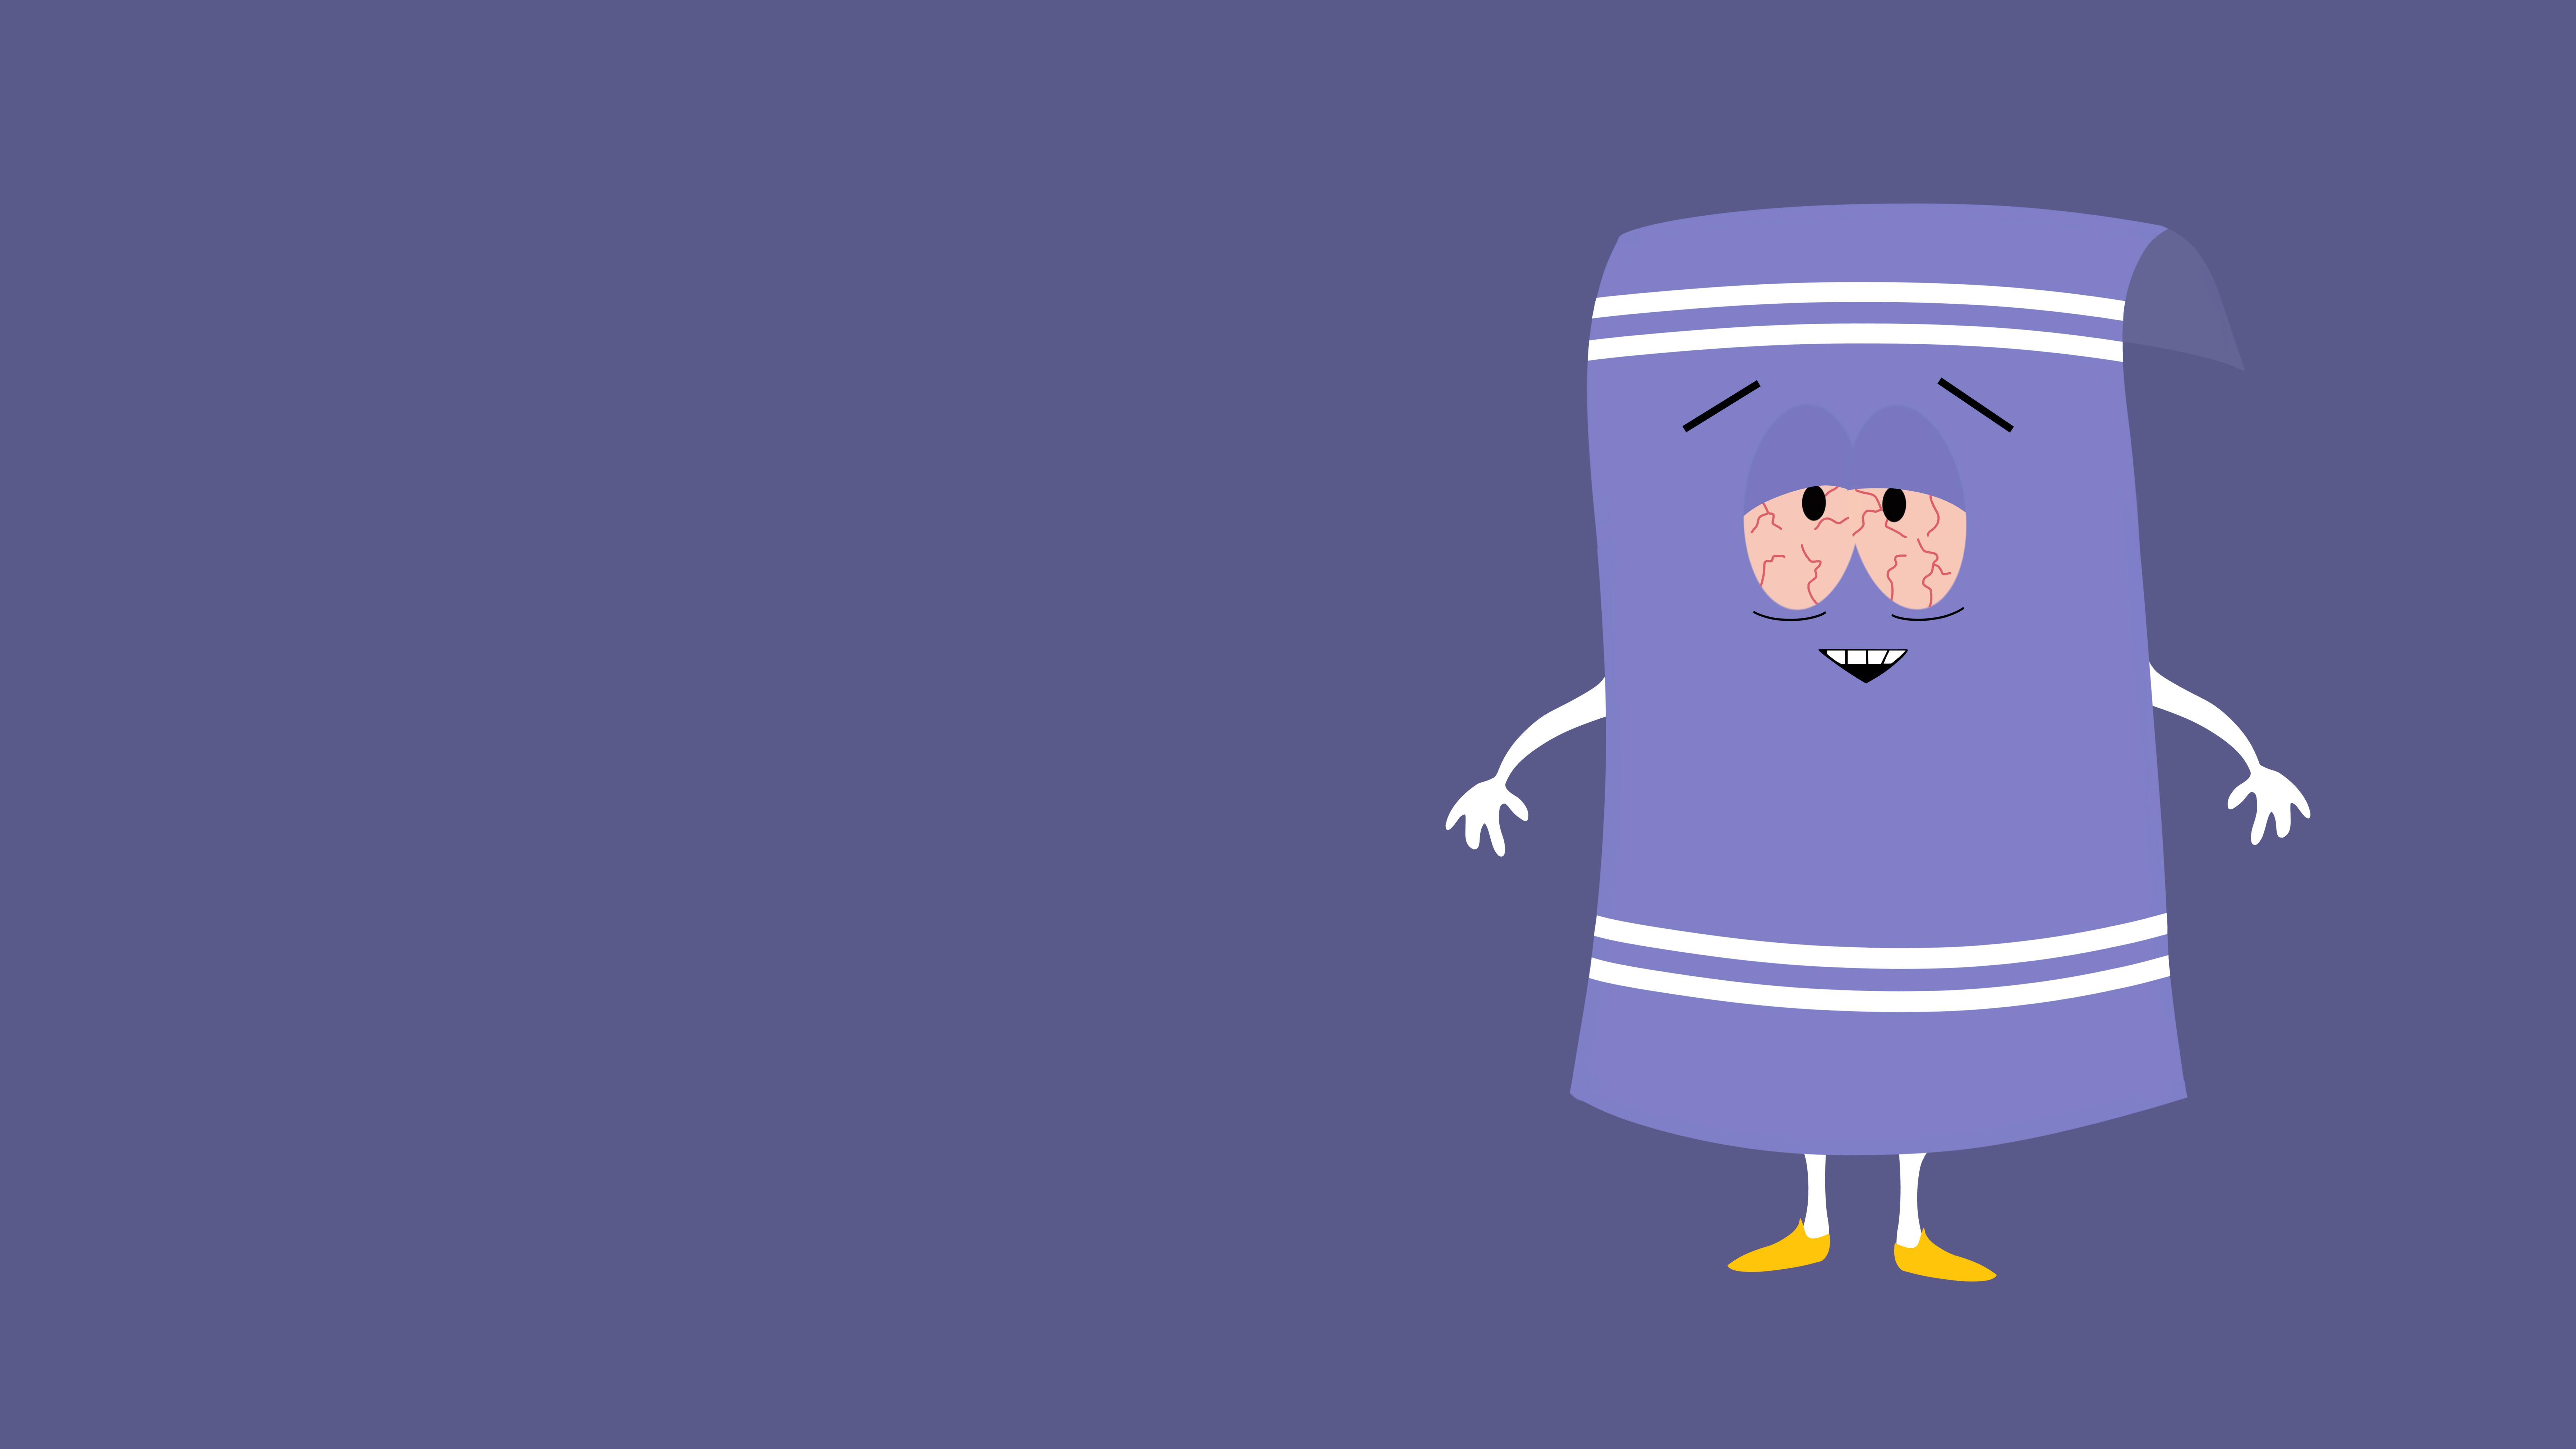 Towelie South Park Minimalism 8k